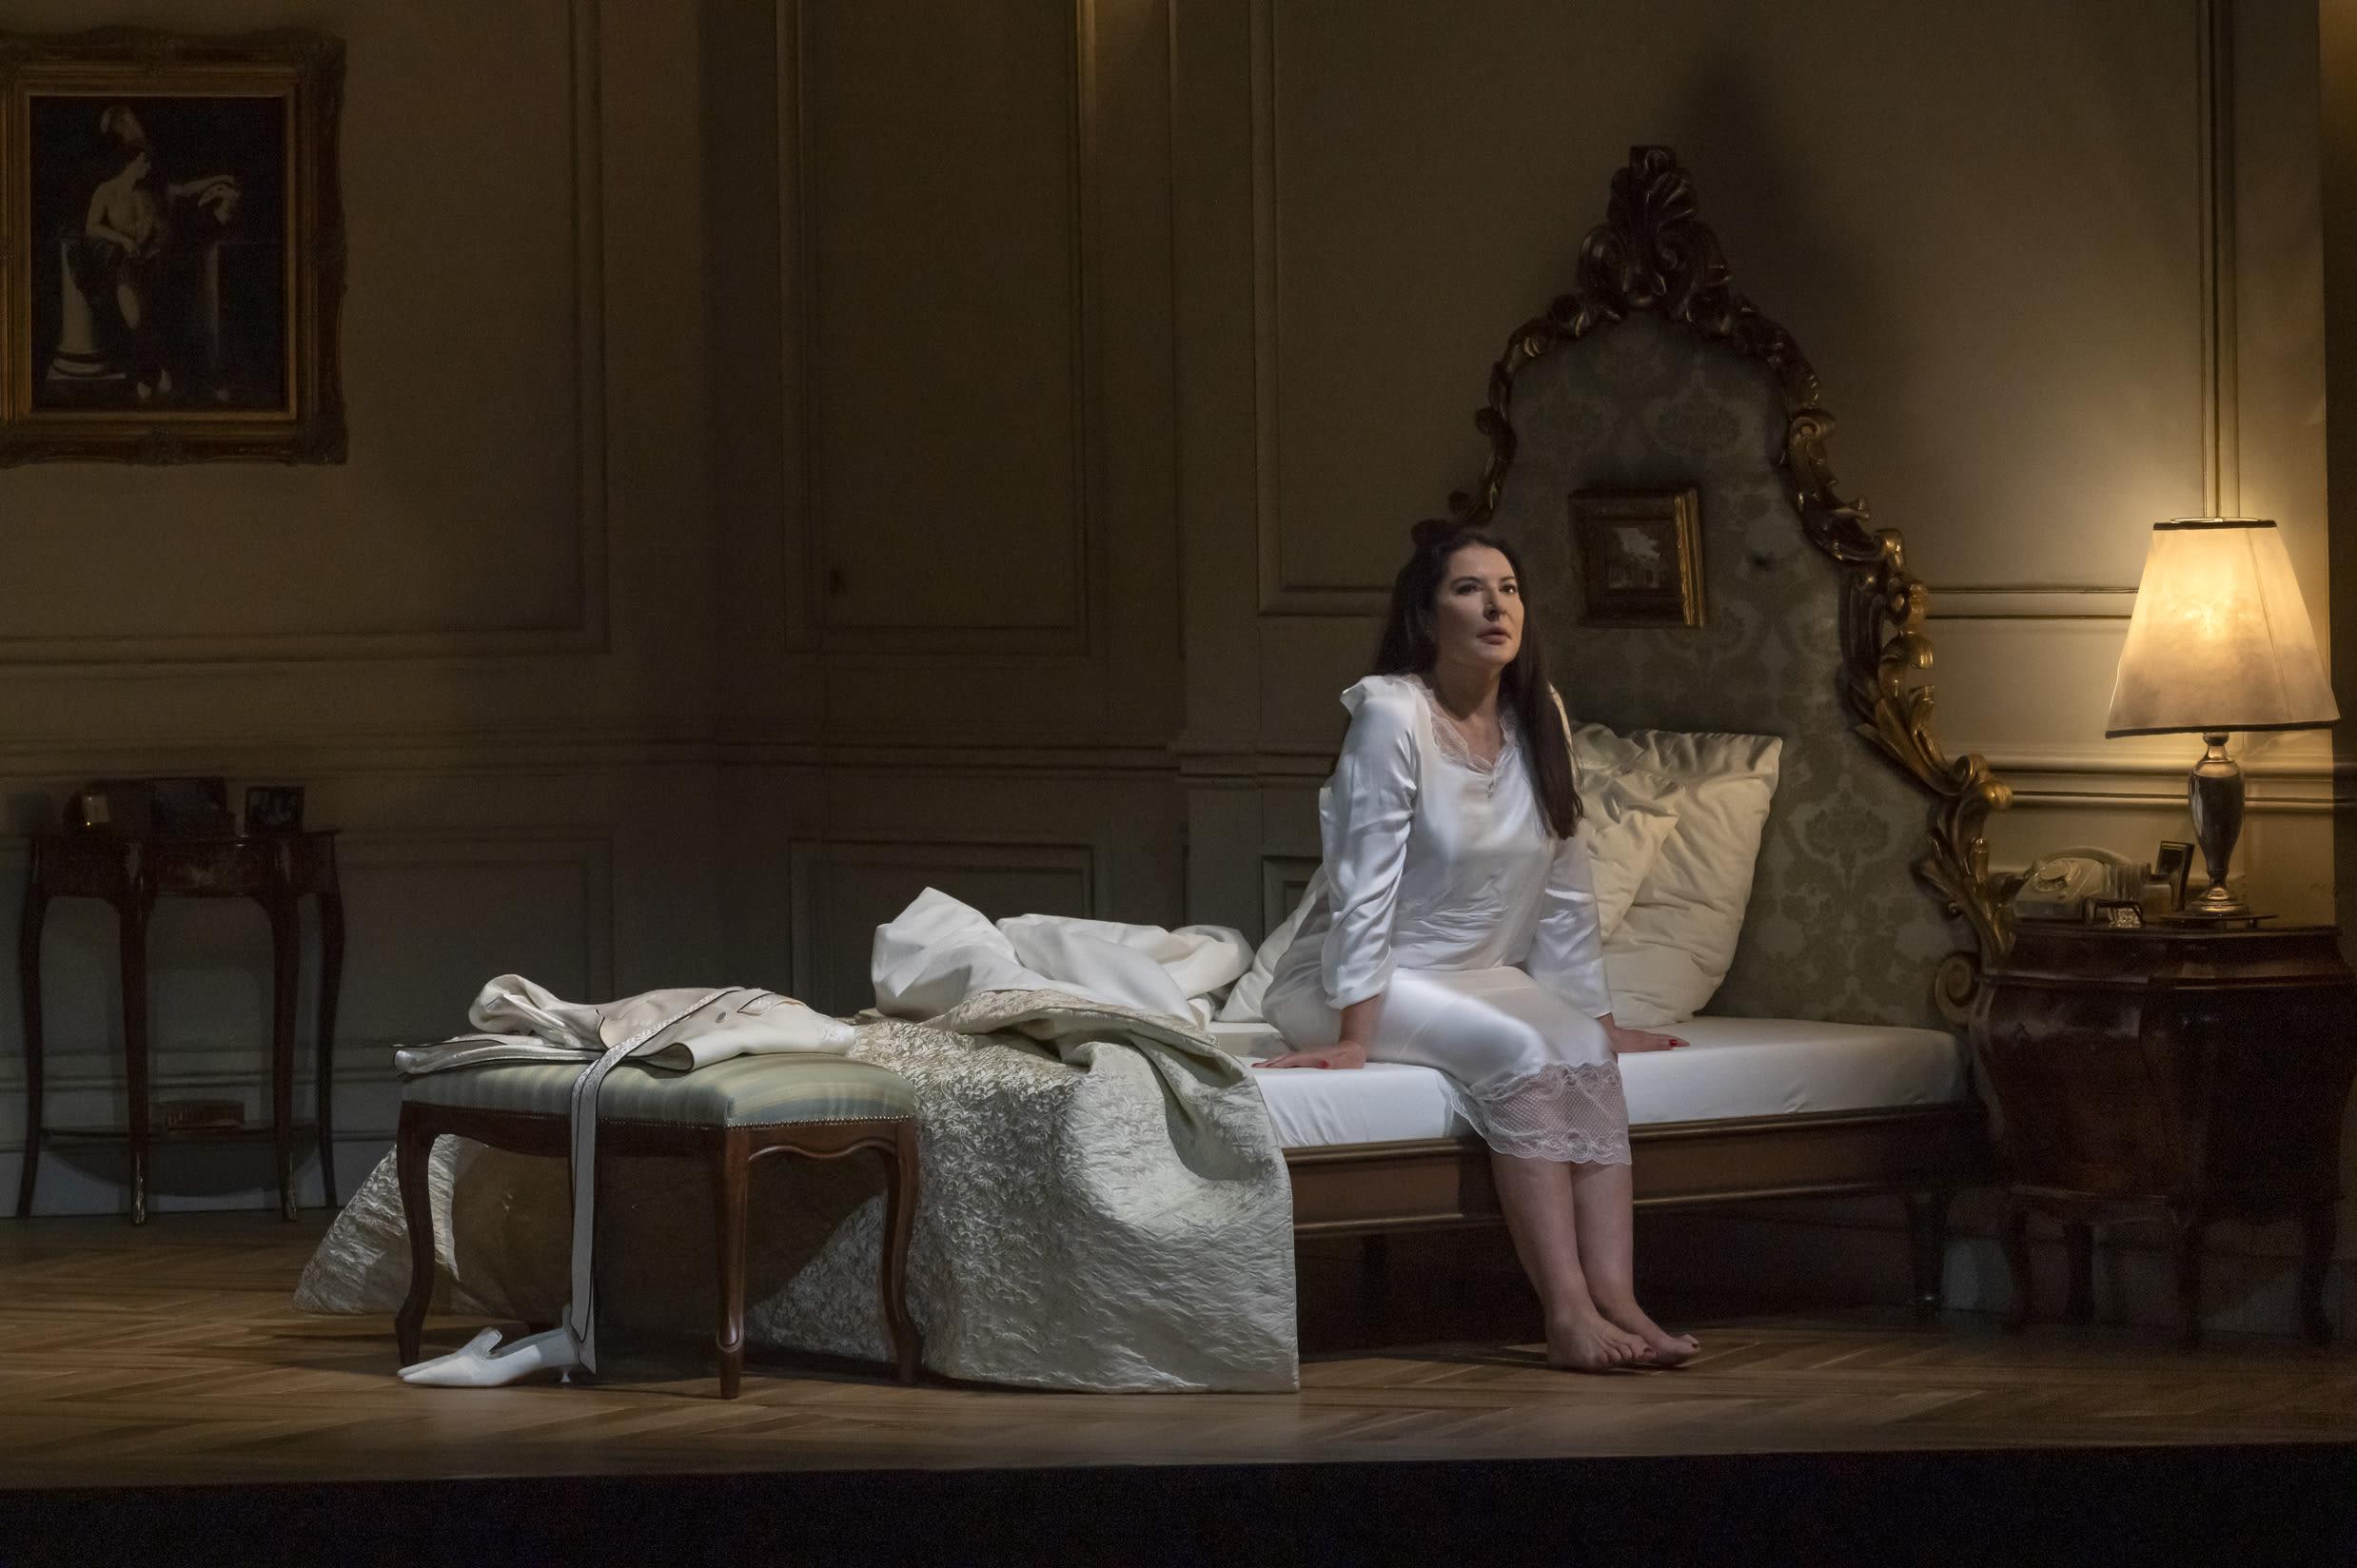 7 Deaths of Maria Callas 21-22 © Charles Duprat - OnP (20)